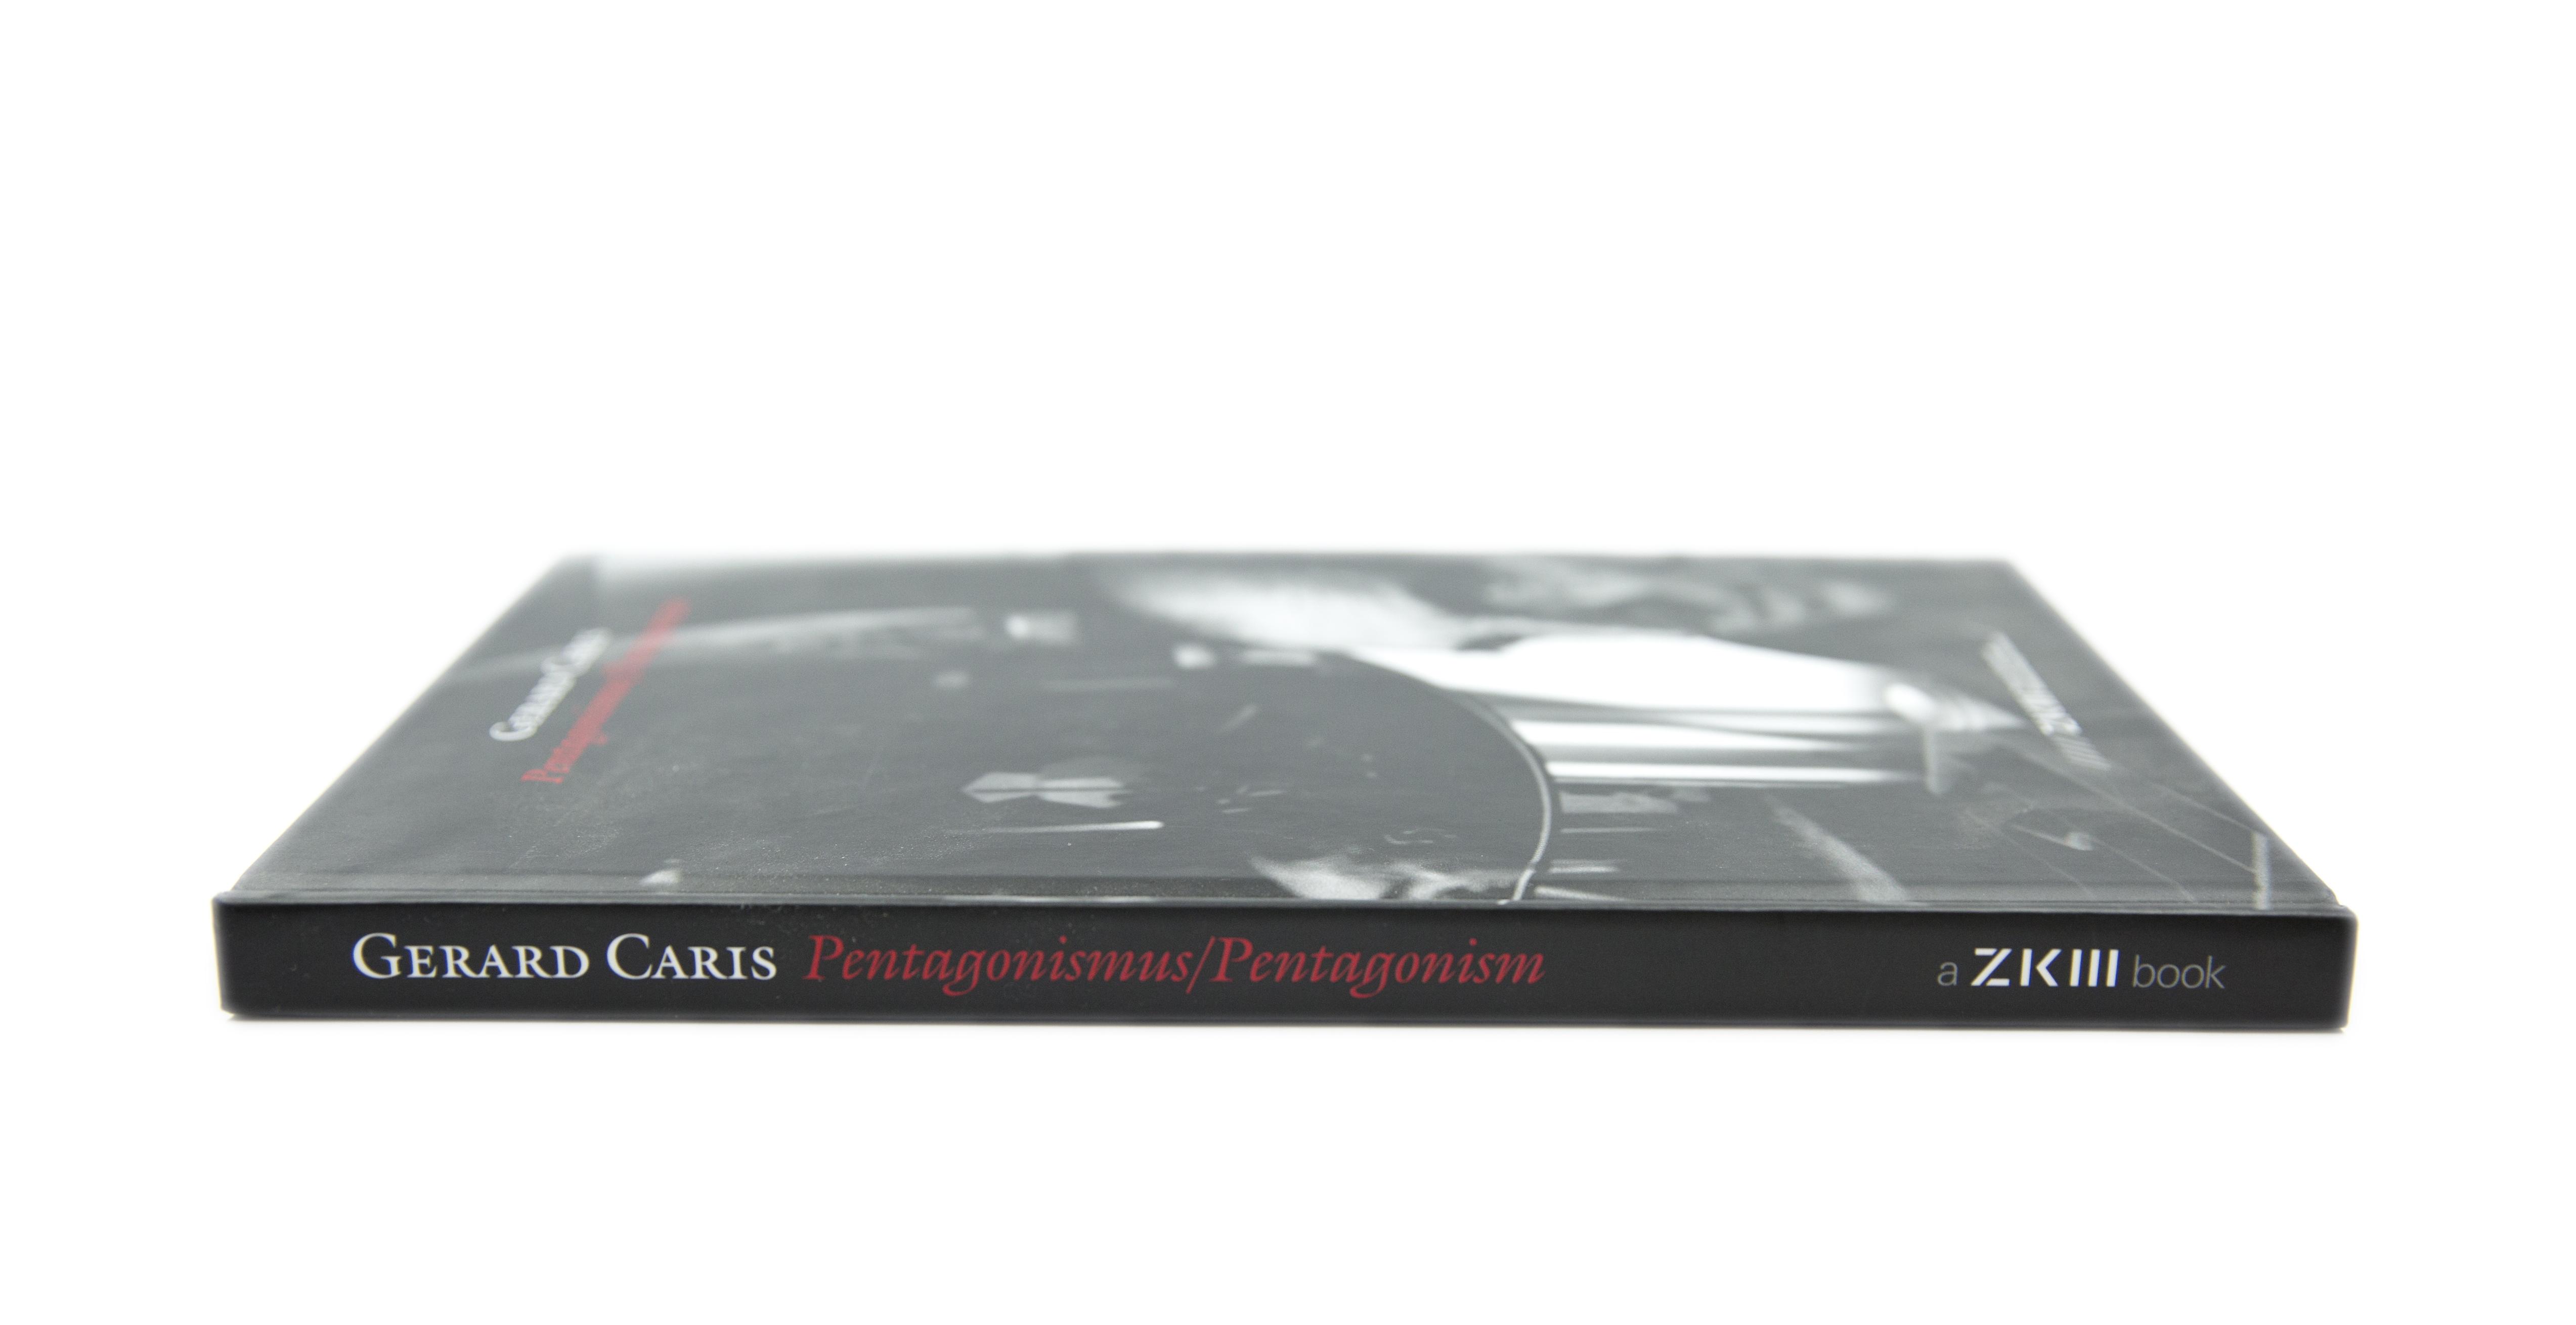 Gerard Caris: Pentagonismus / Pentagonism